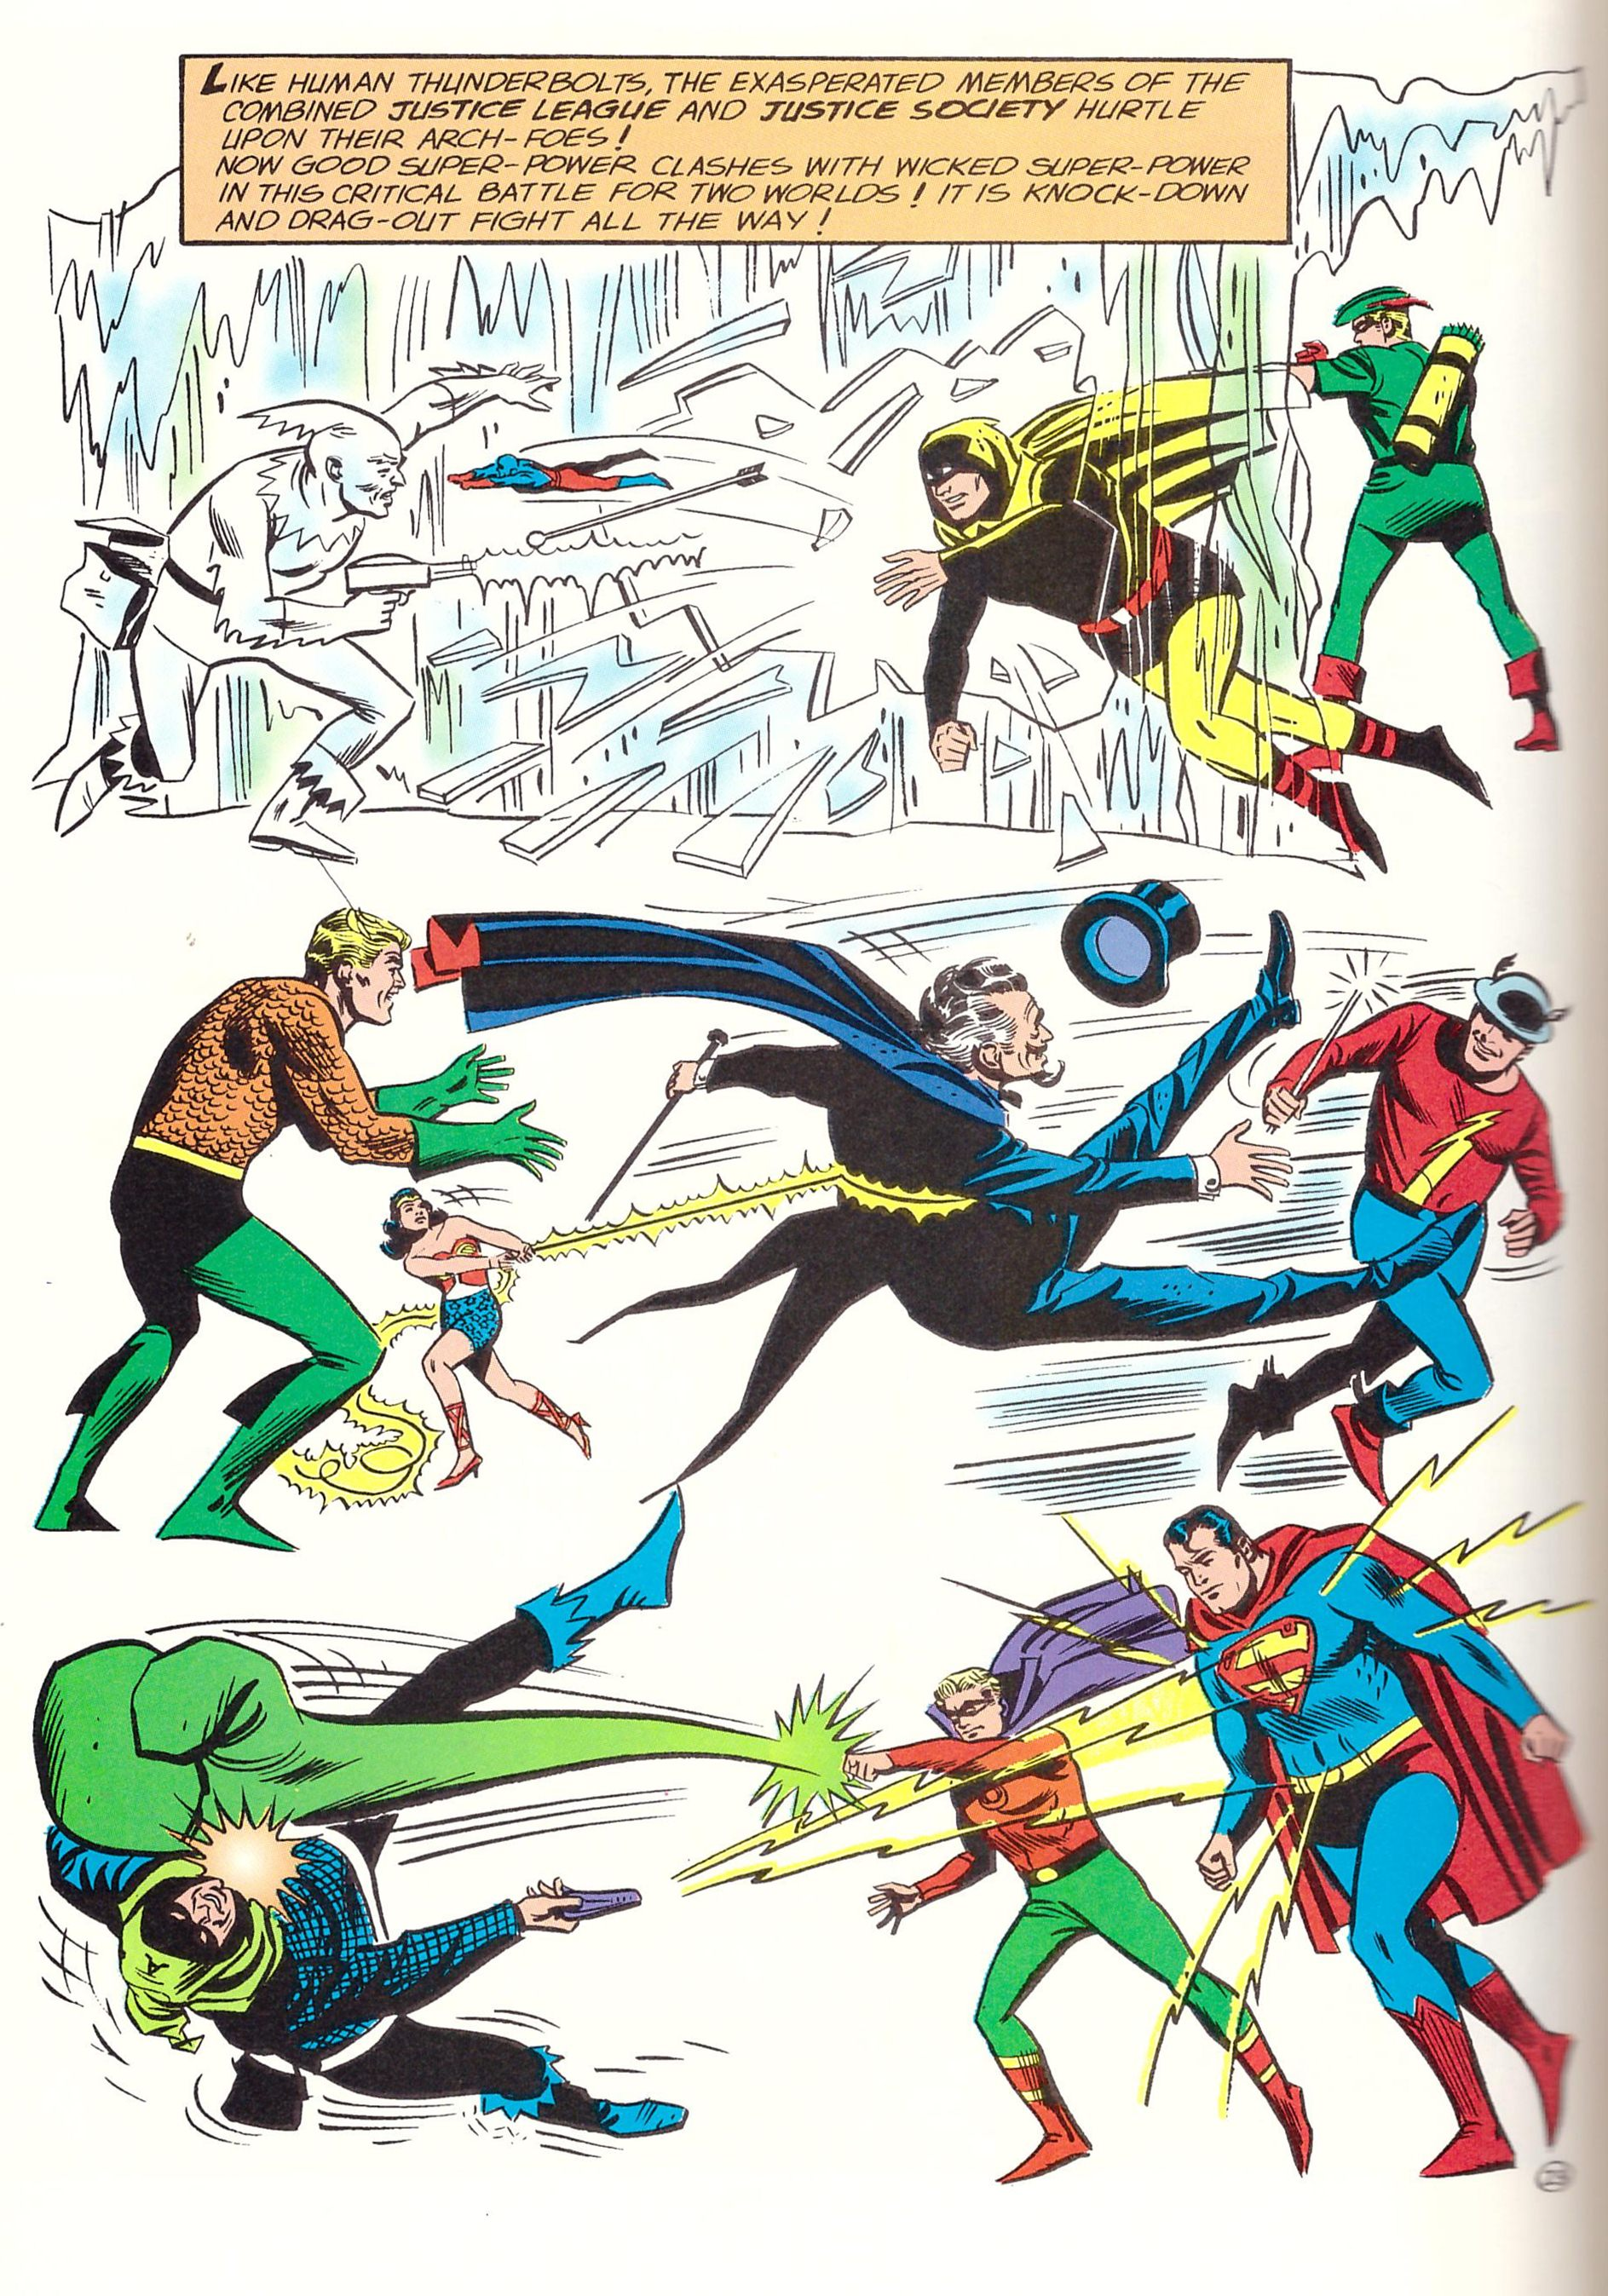 Justice League of America Omnibus 1 review